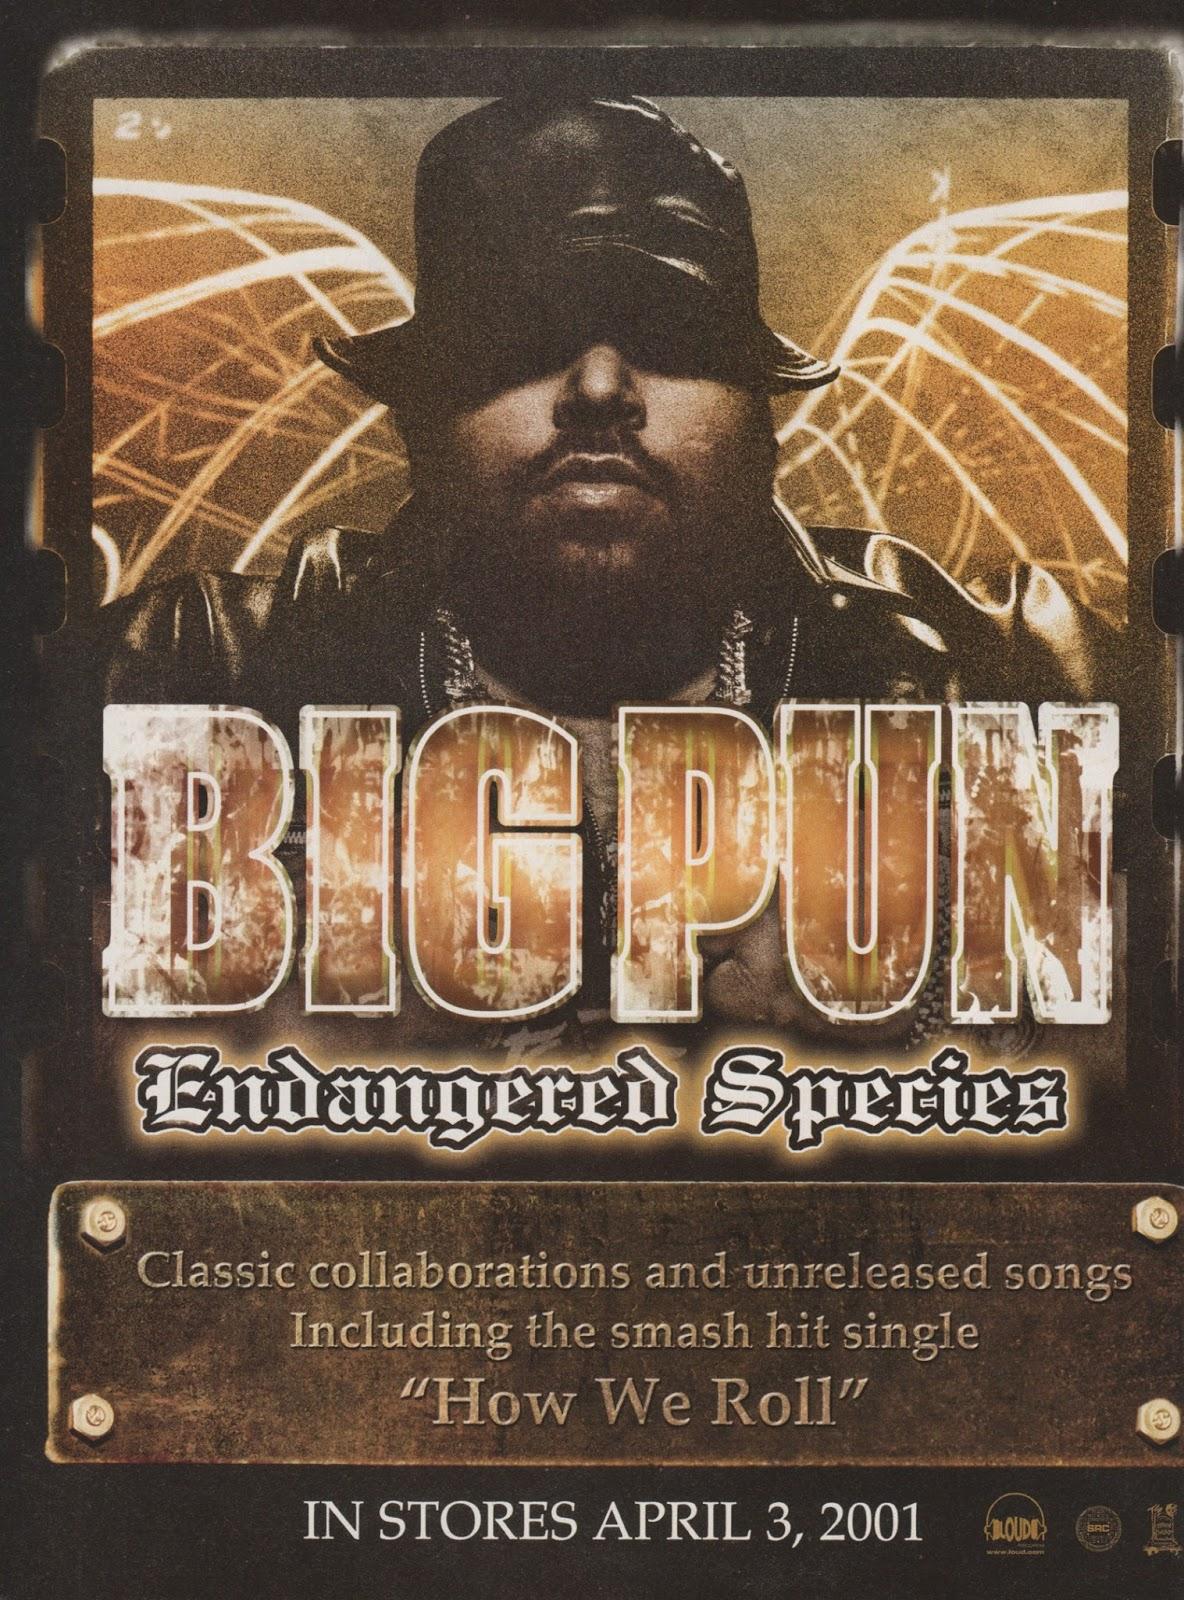 Big Pun Endangered Species Advertisement 2001